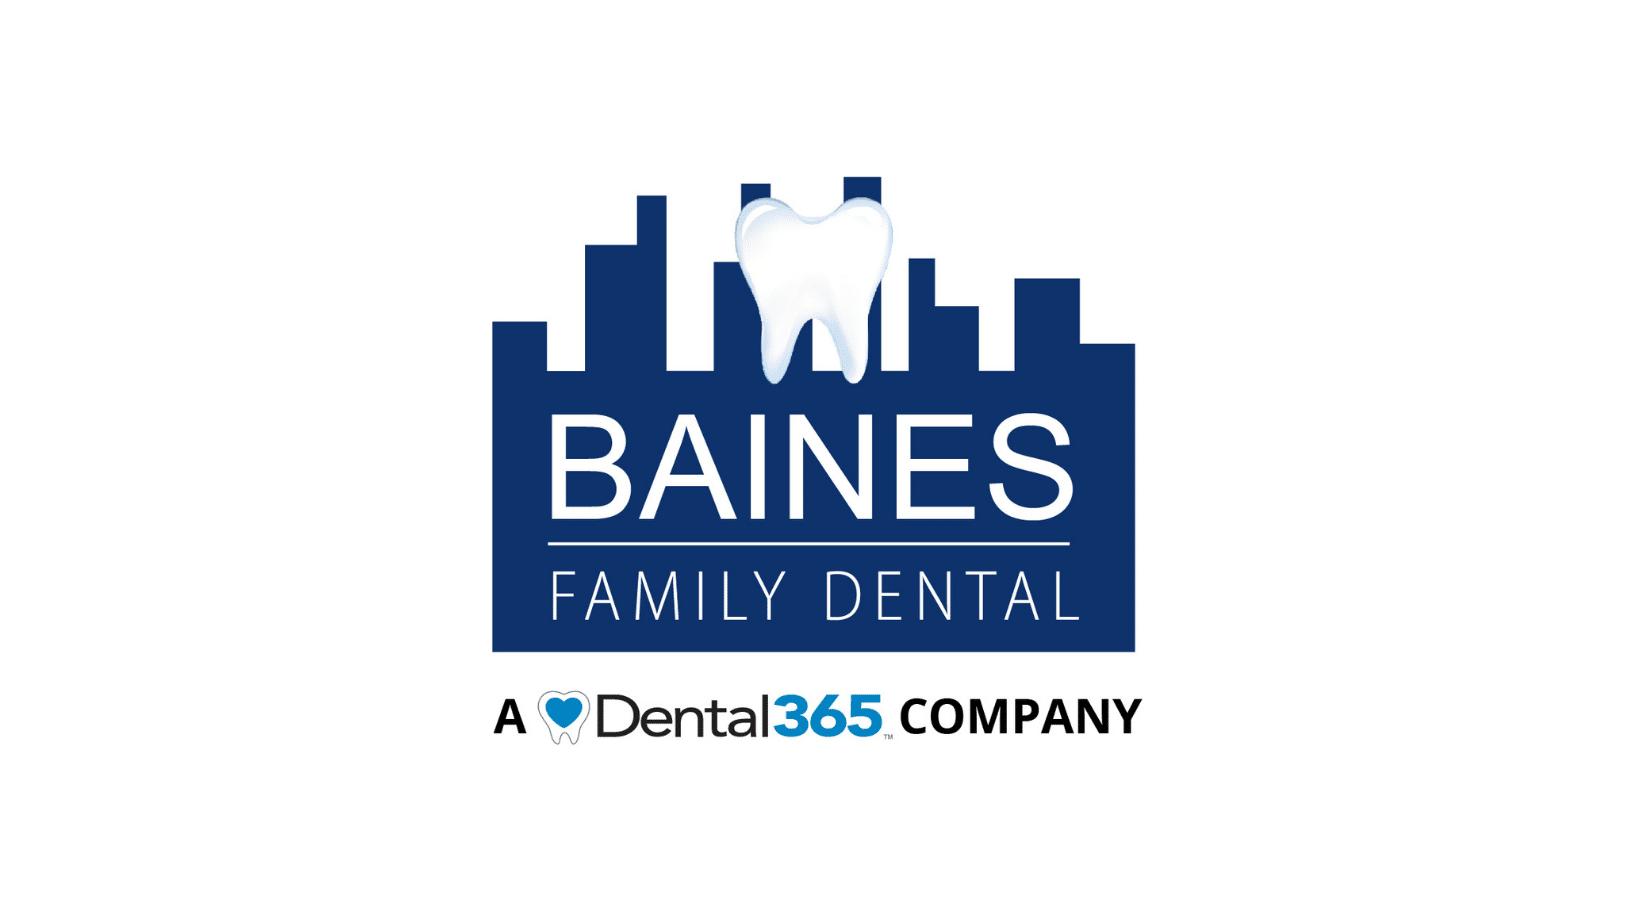 Baines Family Dental Logo